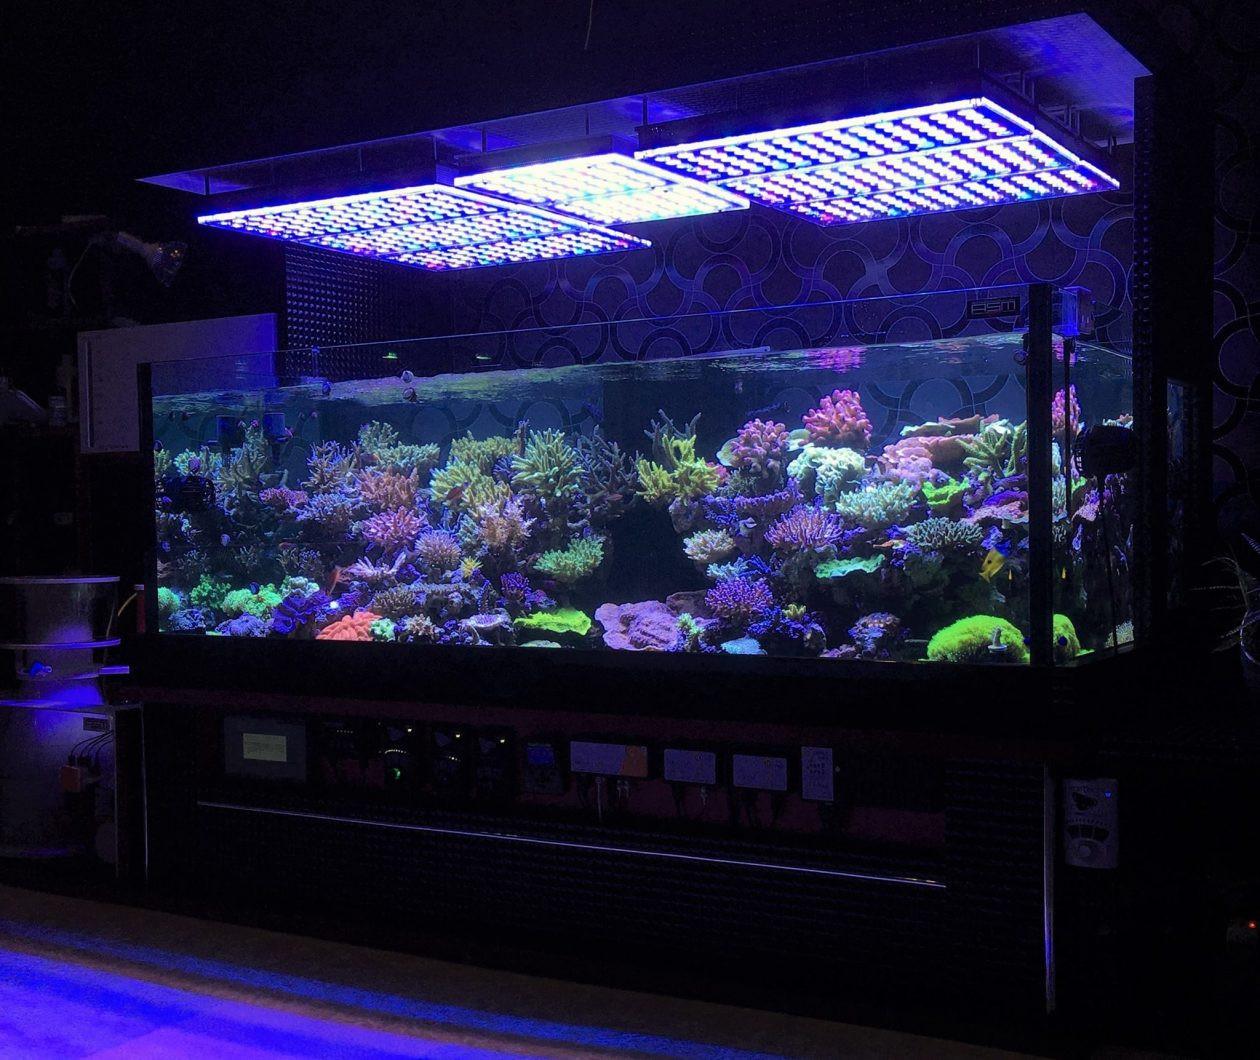 Best ideas about Led Aquarium Lights . Save or Pin Orphek Atlantik pact V3 Plus Internet of Things Now.